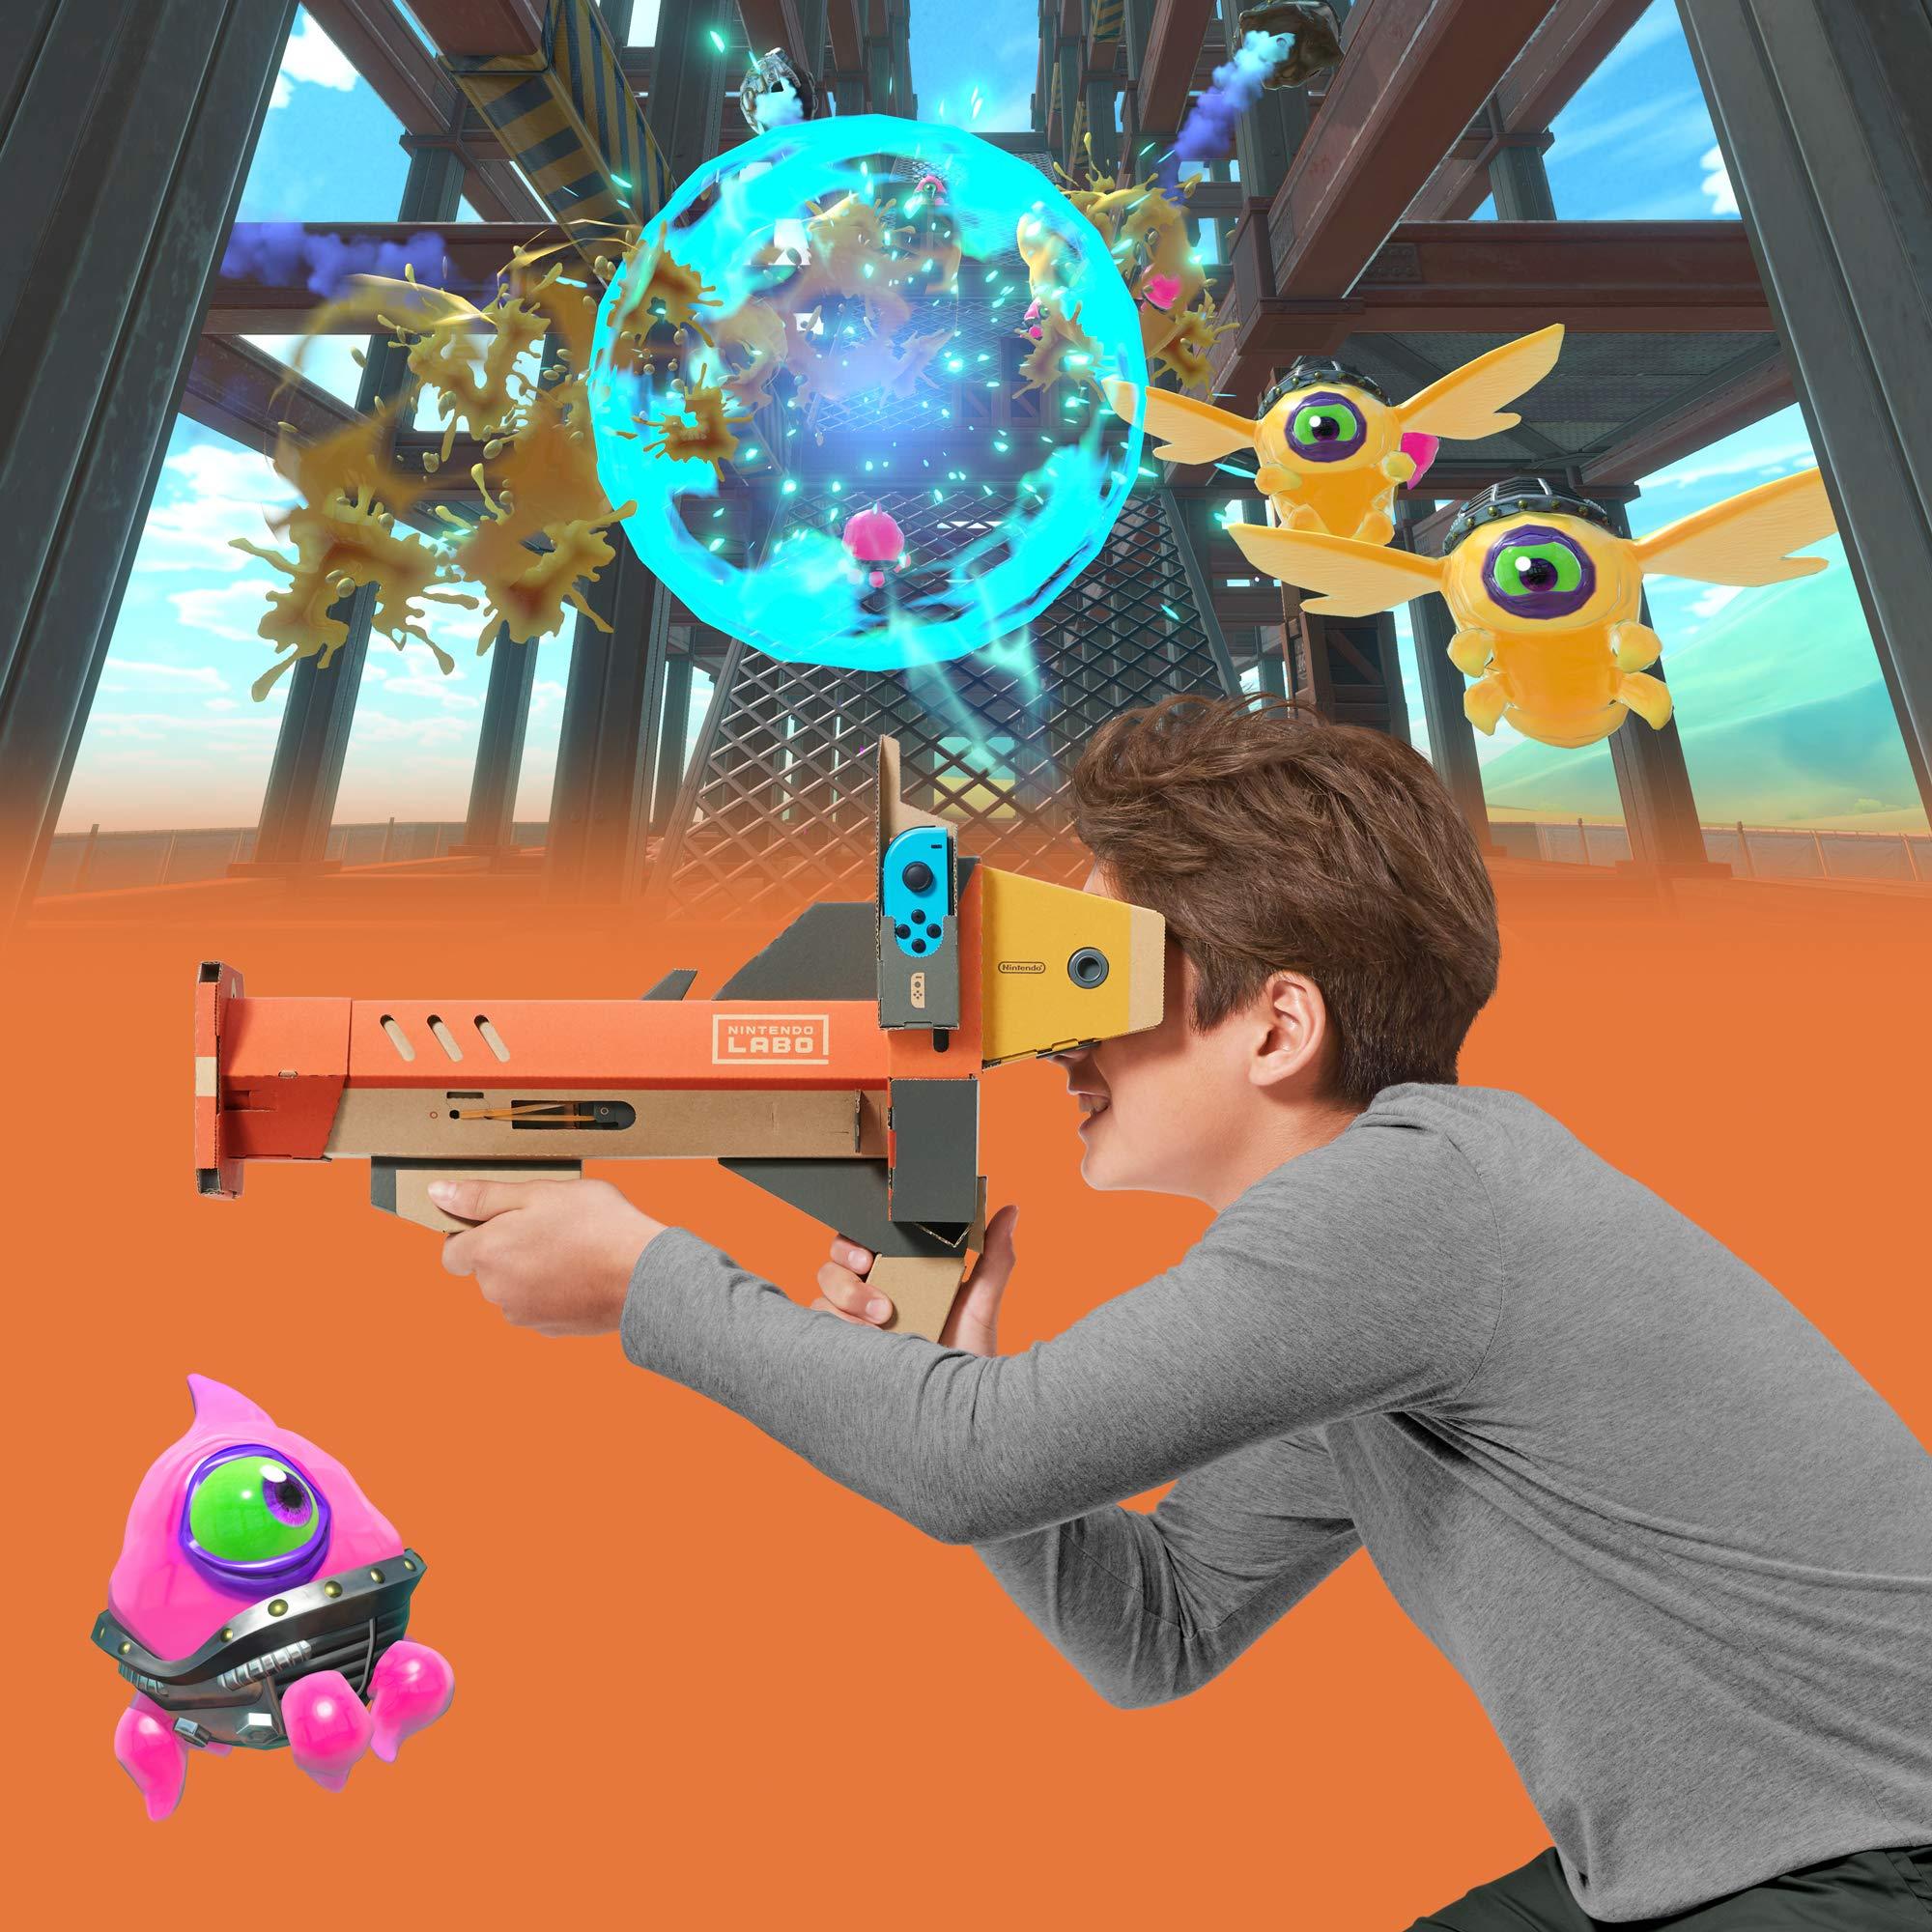 Nintendo Labo Toy-Con 04: VR Kit - Starter Set + Blaster - Switch by Nintendo (Image #7)